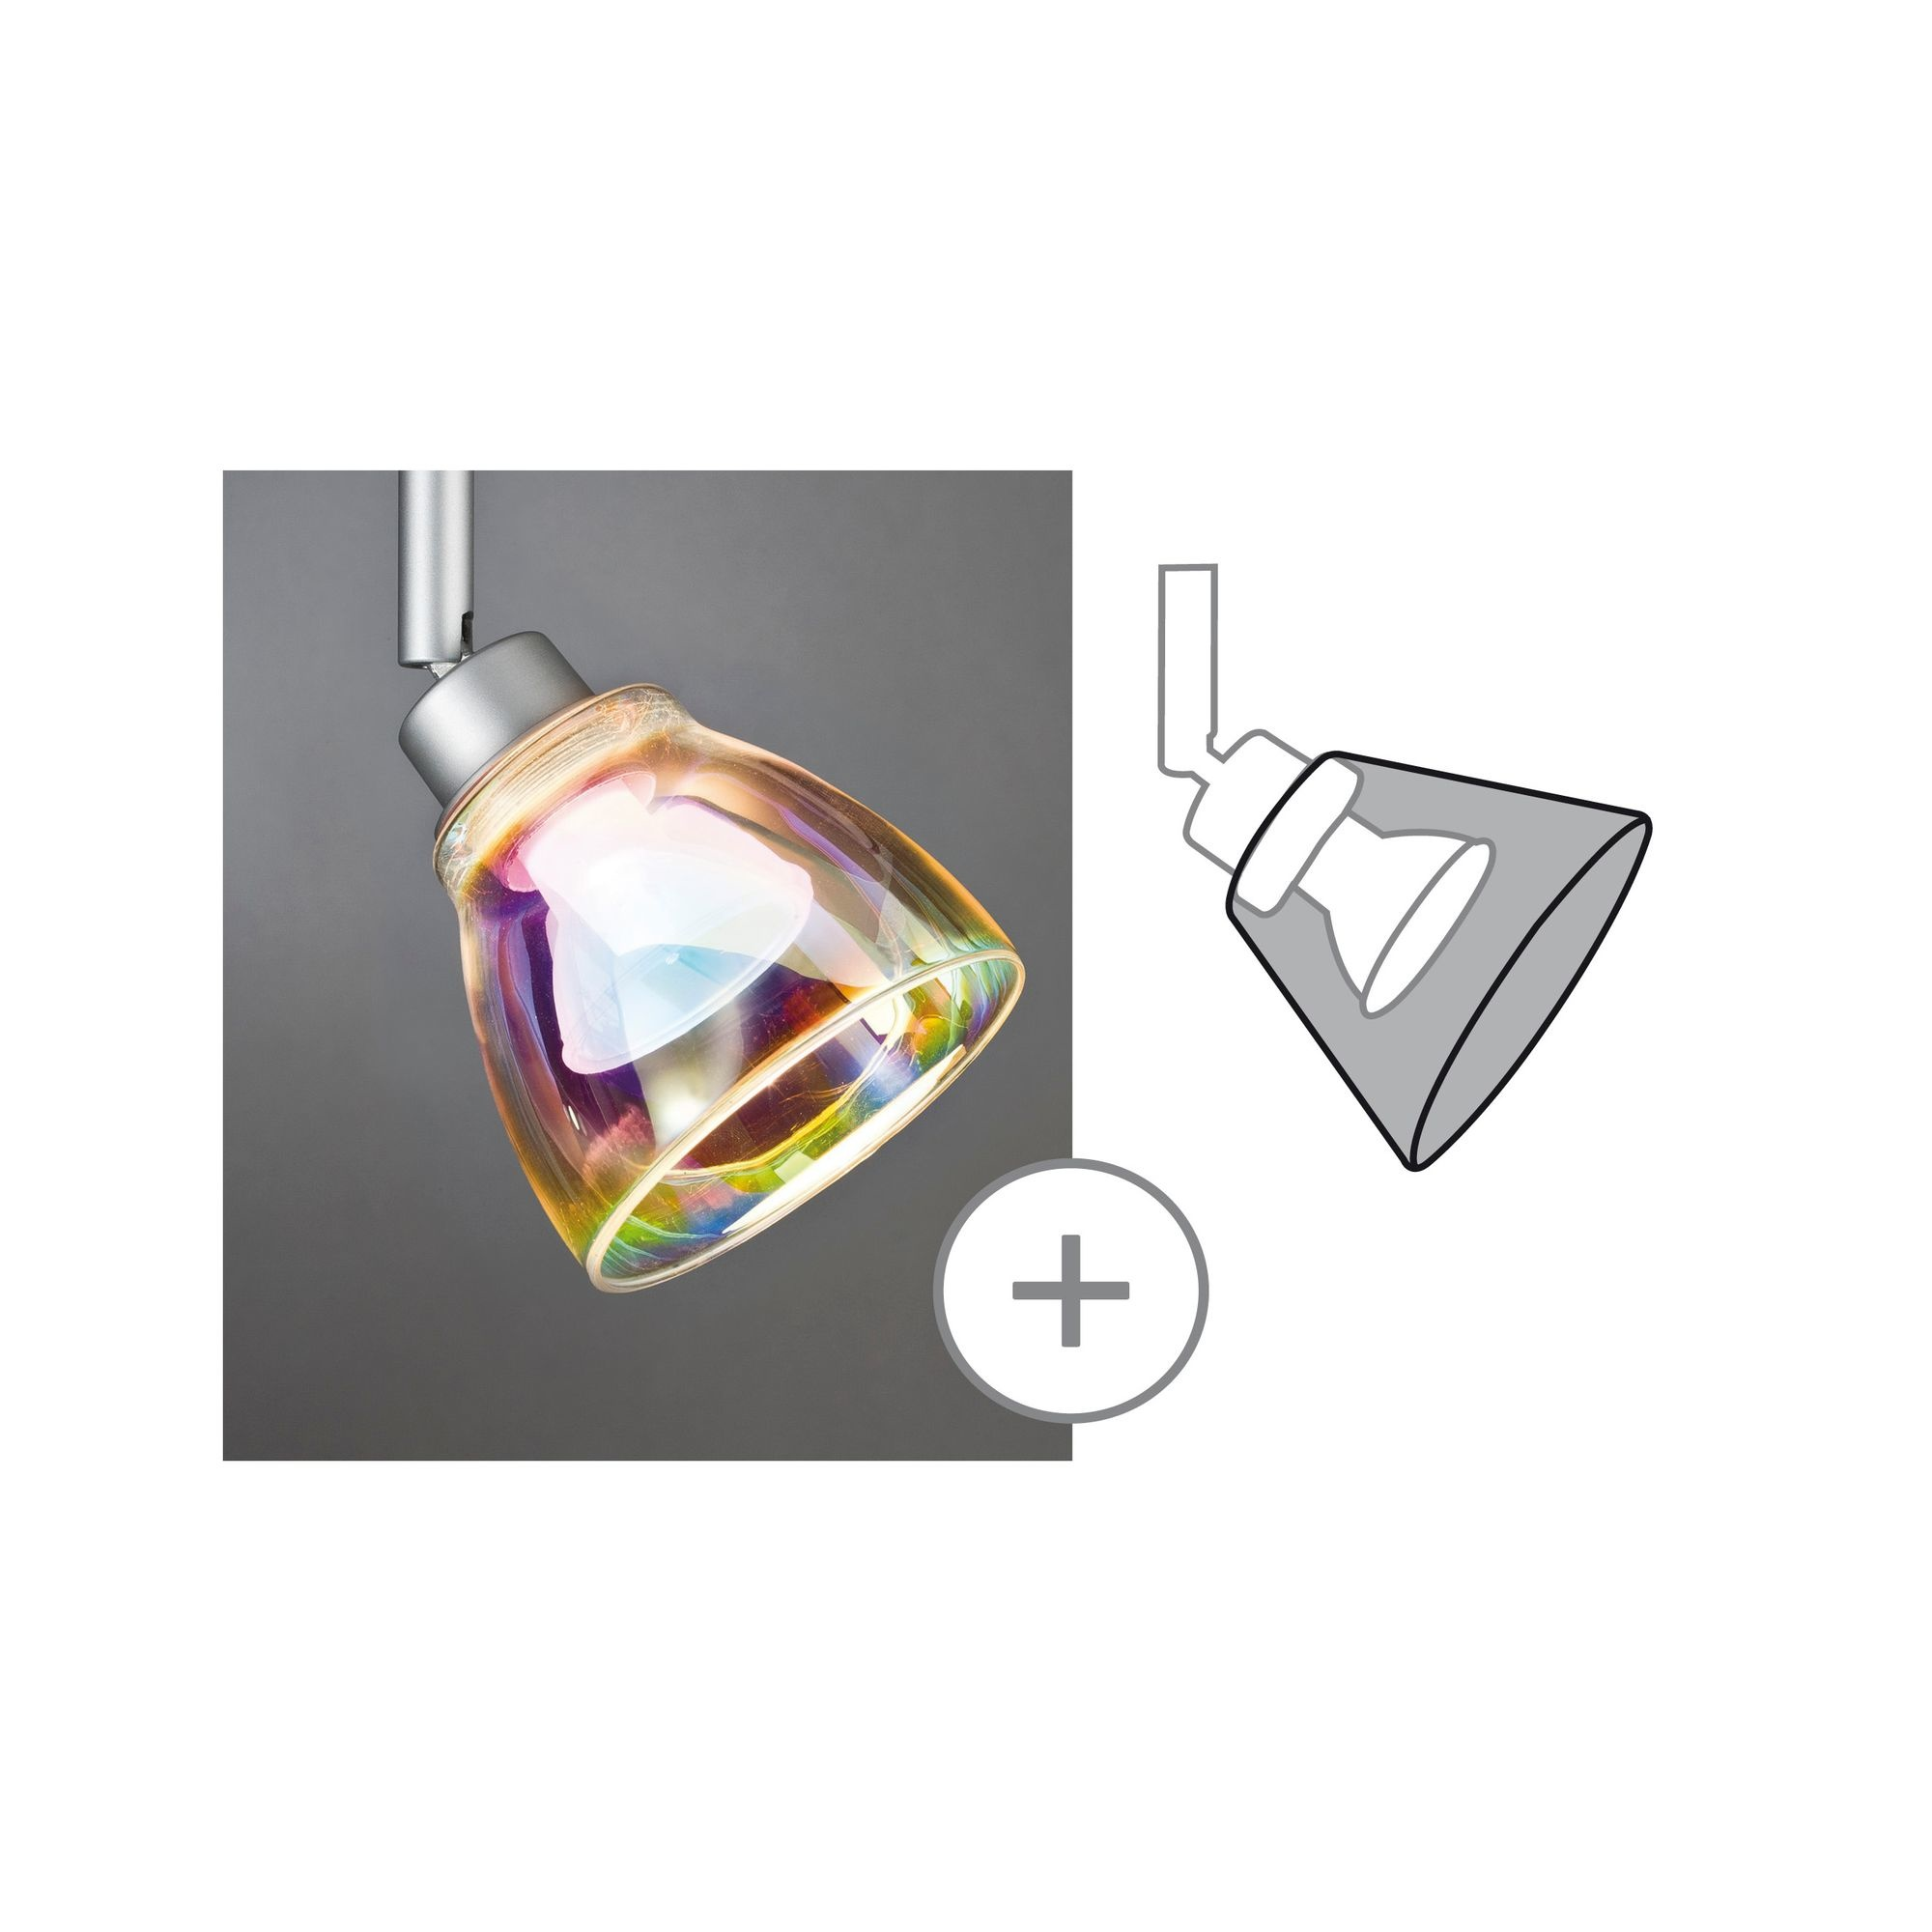 Paulmann DecoSystems Schirm Wolbi max.50W Glas Dichroitic